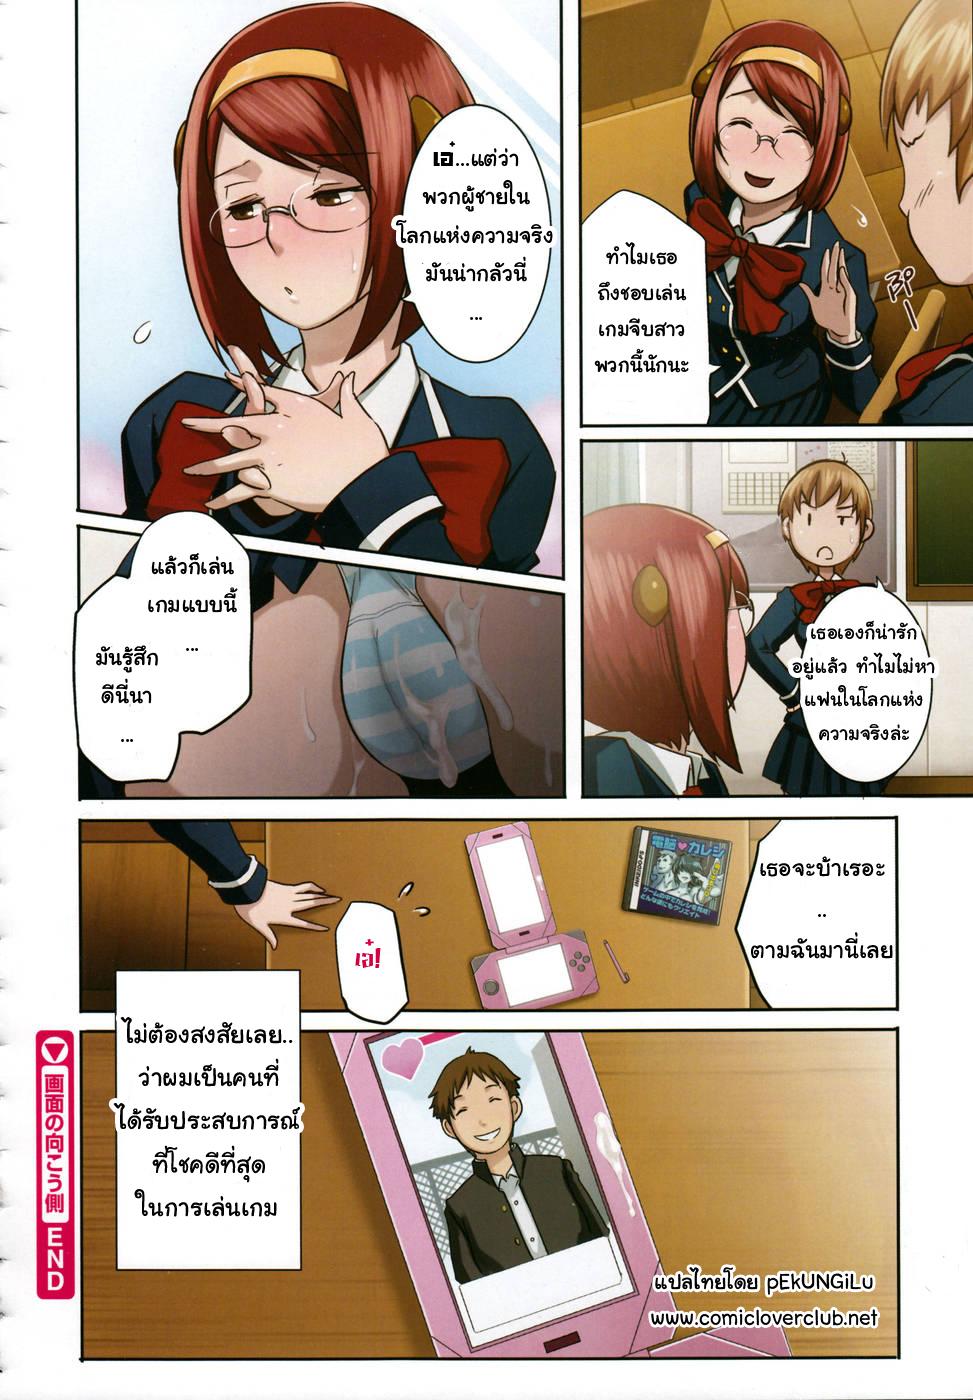 Gamen no Mukou Gawa | On the Other Side of the Screen (COMIC Megastore 2011-03) [Thai ภาษาไทย] {pEkUNGiLu} หน้า 8